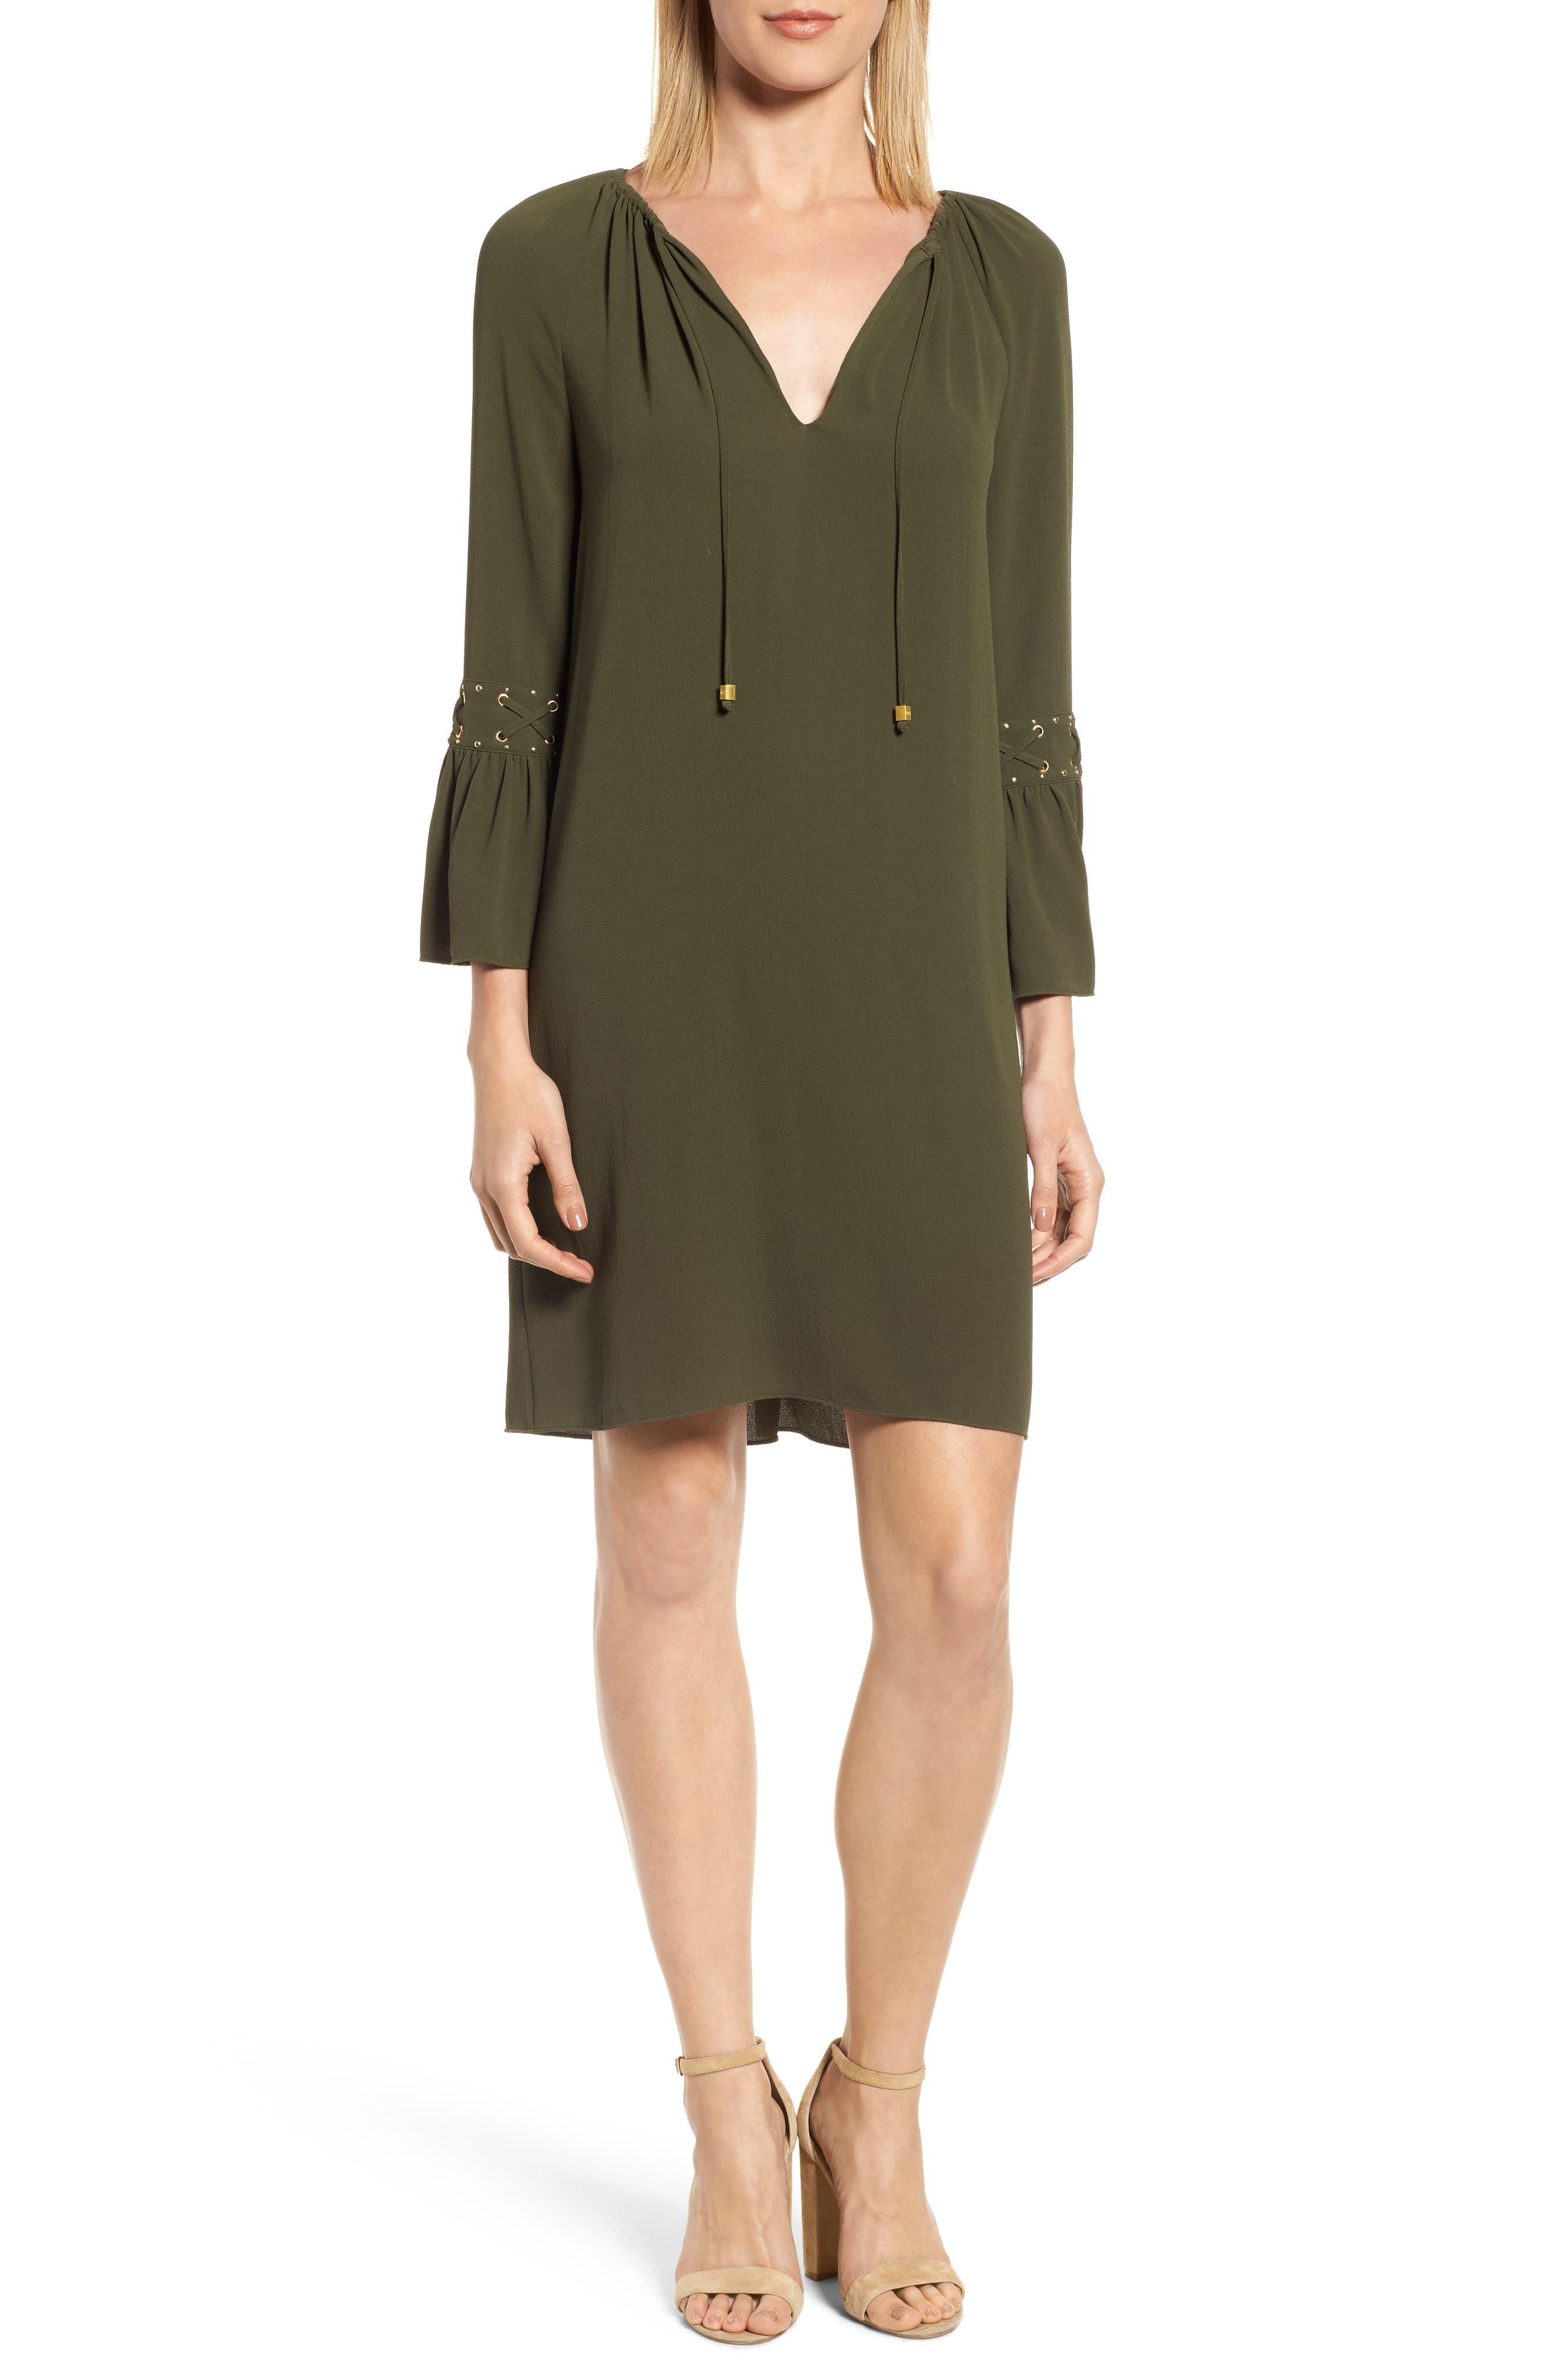 Main Image - MICHAEL Michael Kors Lace-Up Sleeve Dress